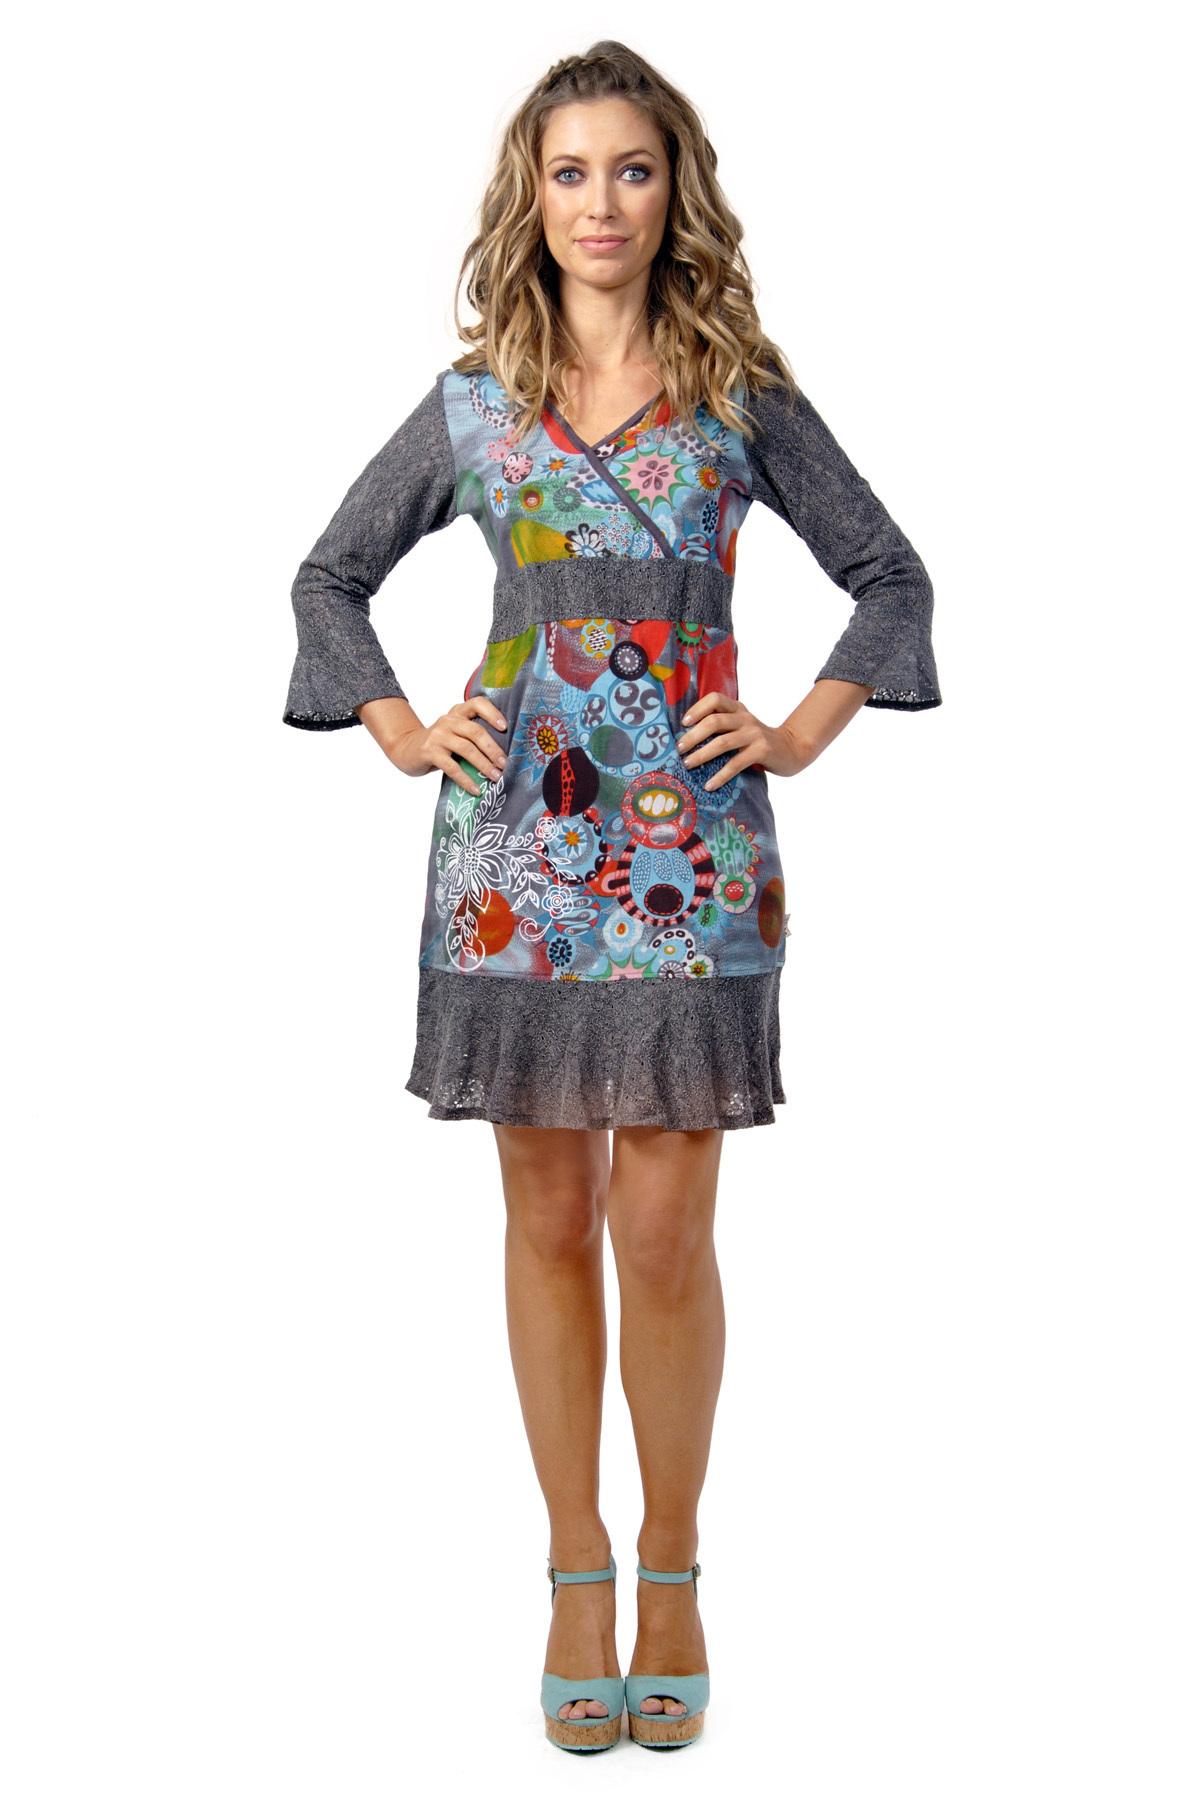 Savage Culture: Arabesque Flower Noa Dress with Tulip Sleeves SAVAGE_30016